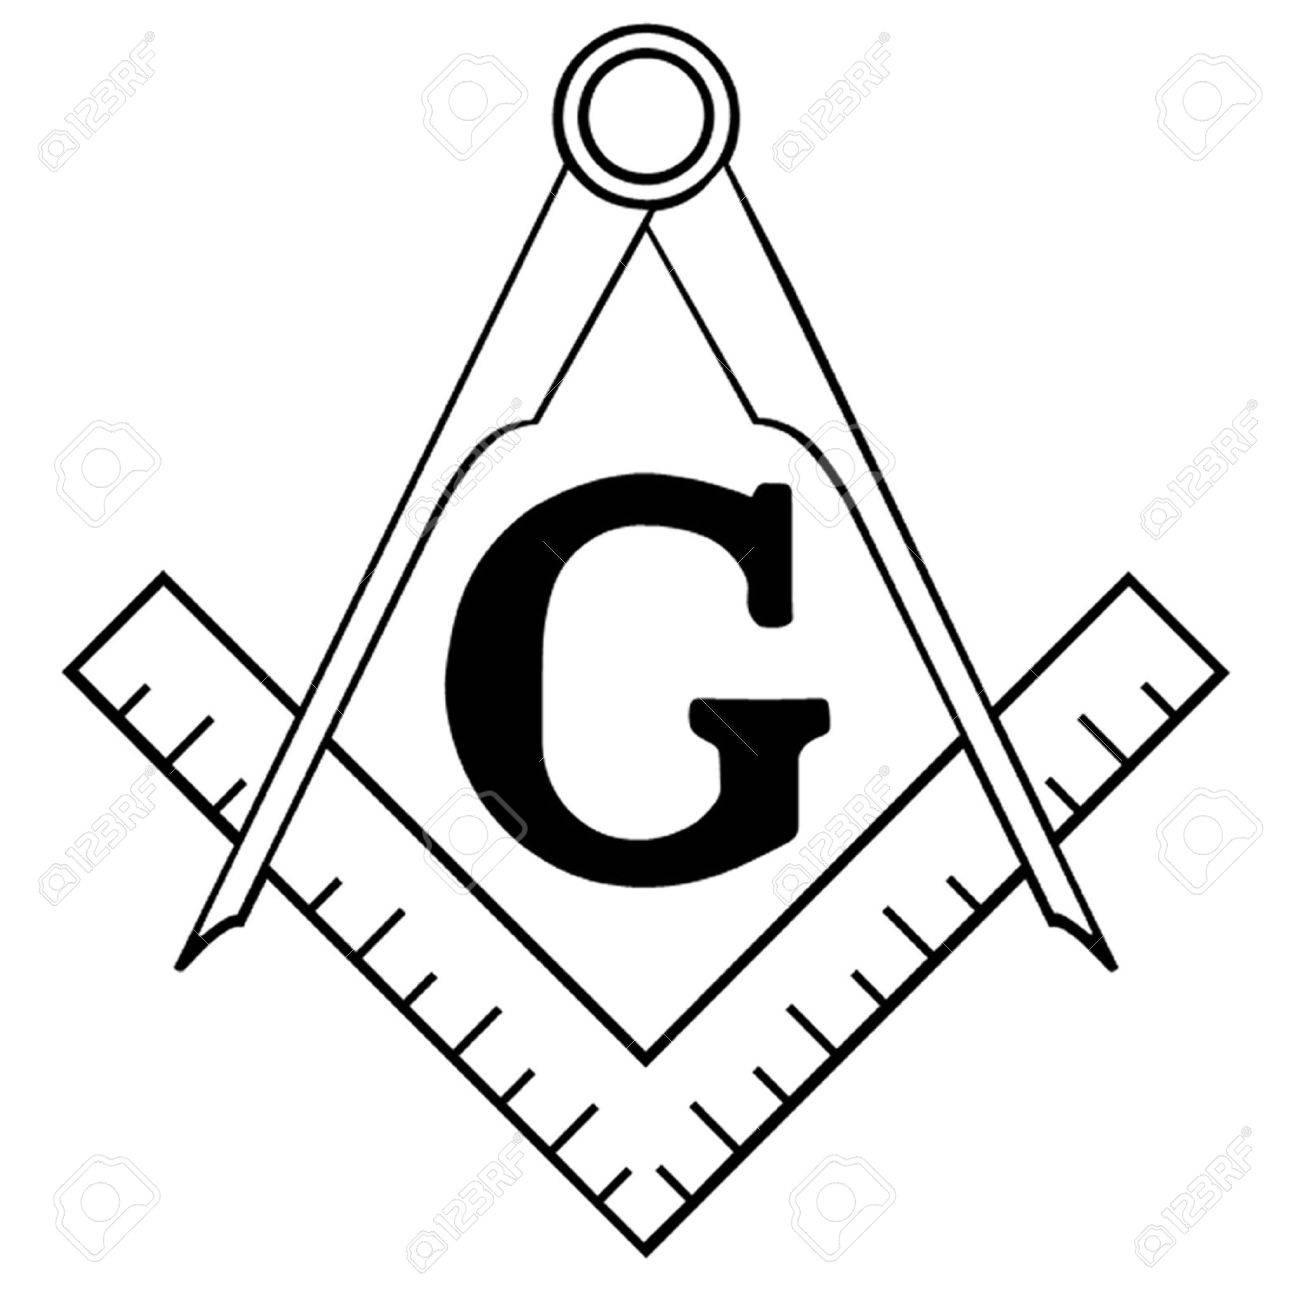 1300x1300 Freemasonry Square And Compasses Royalty Free Cliparts, Vectors